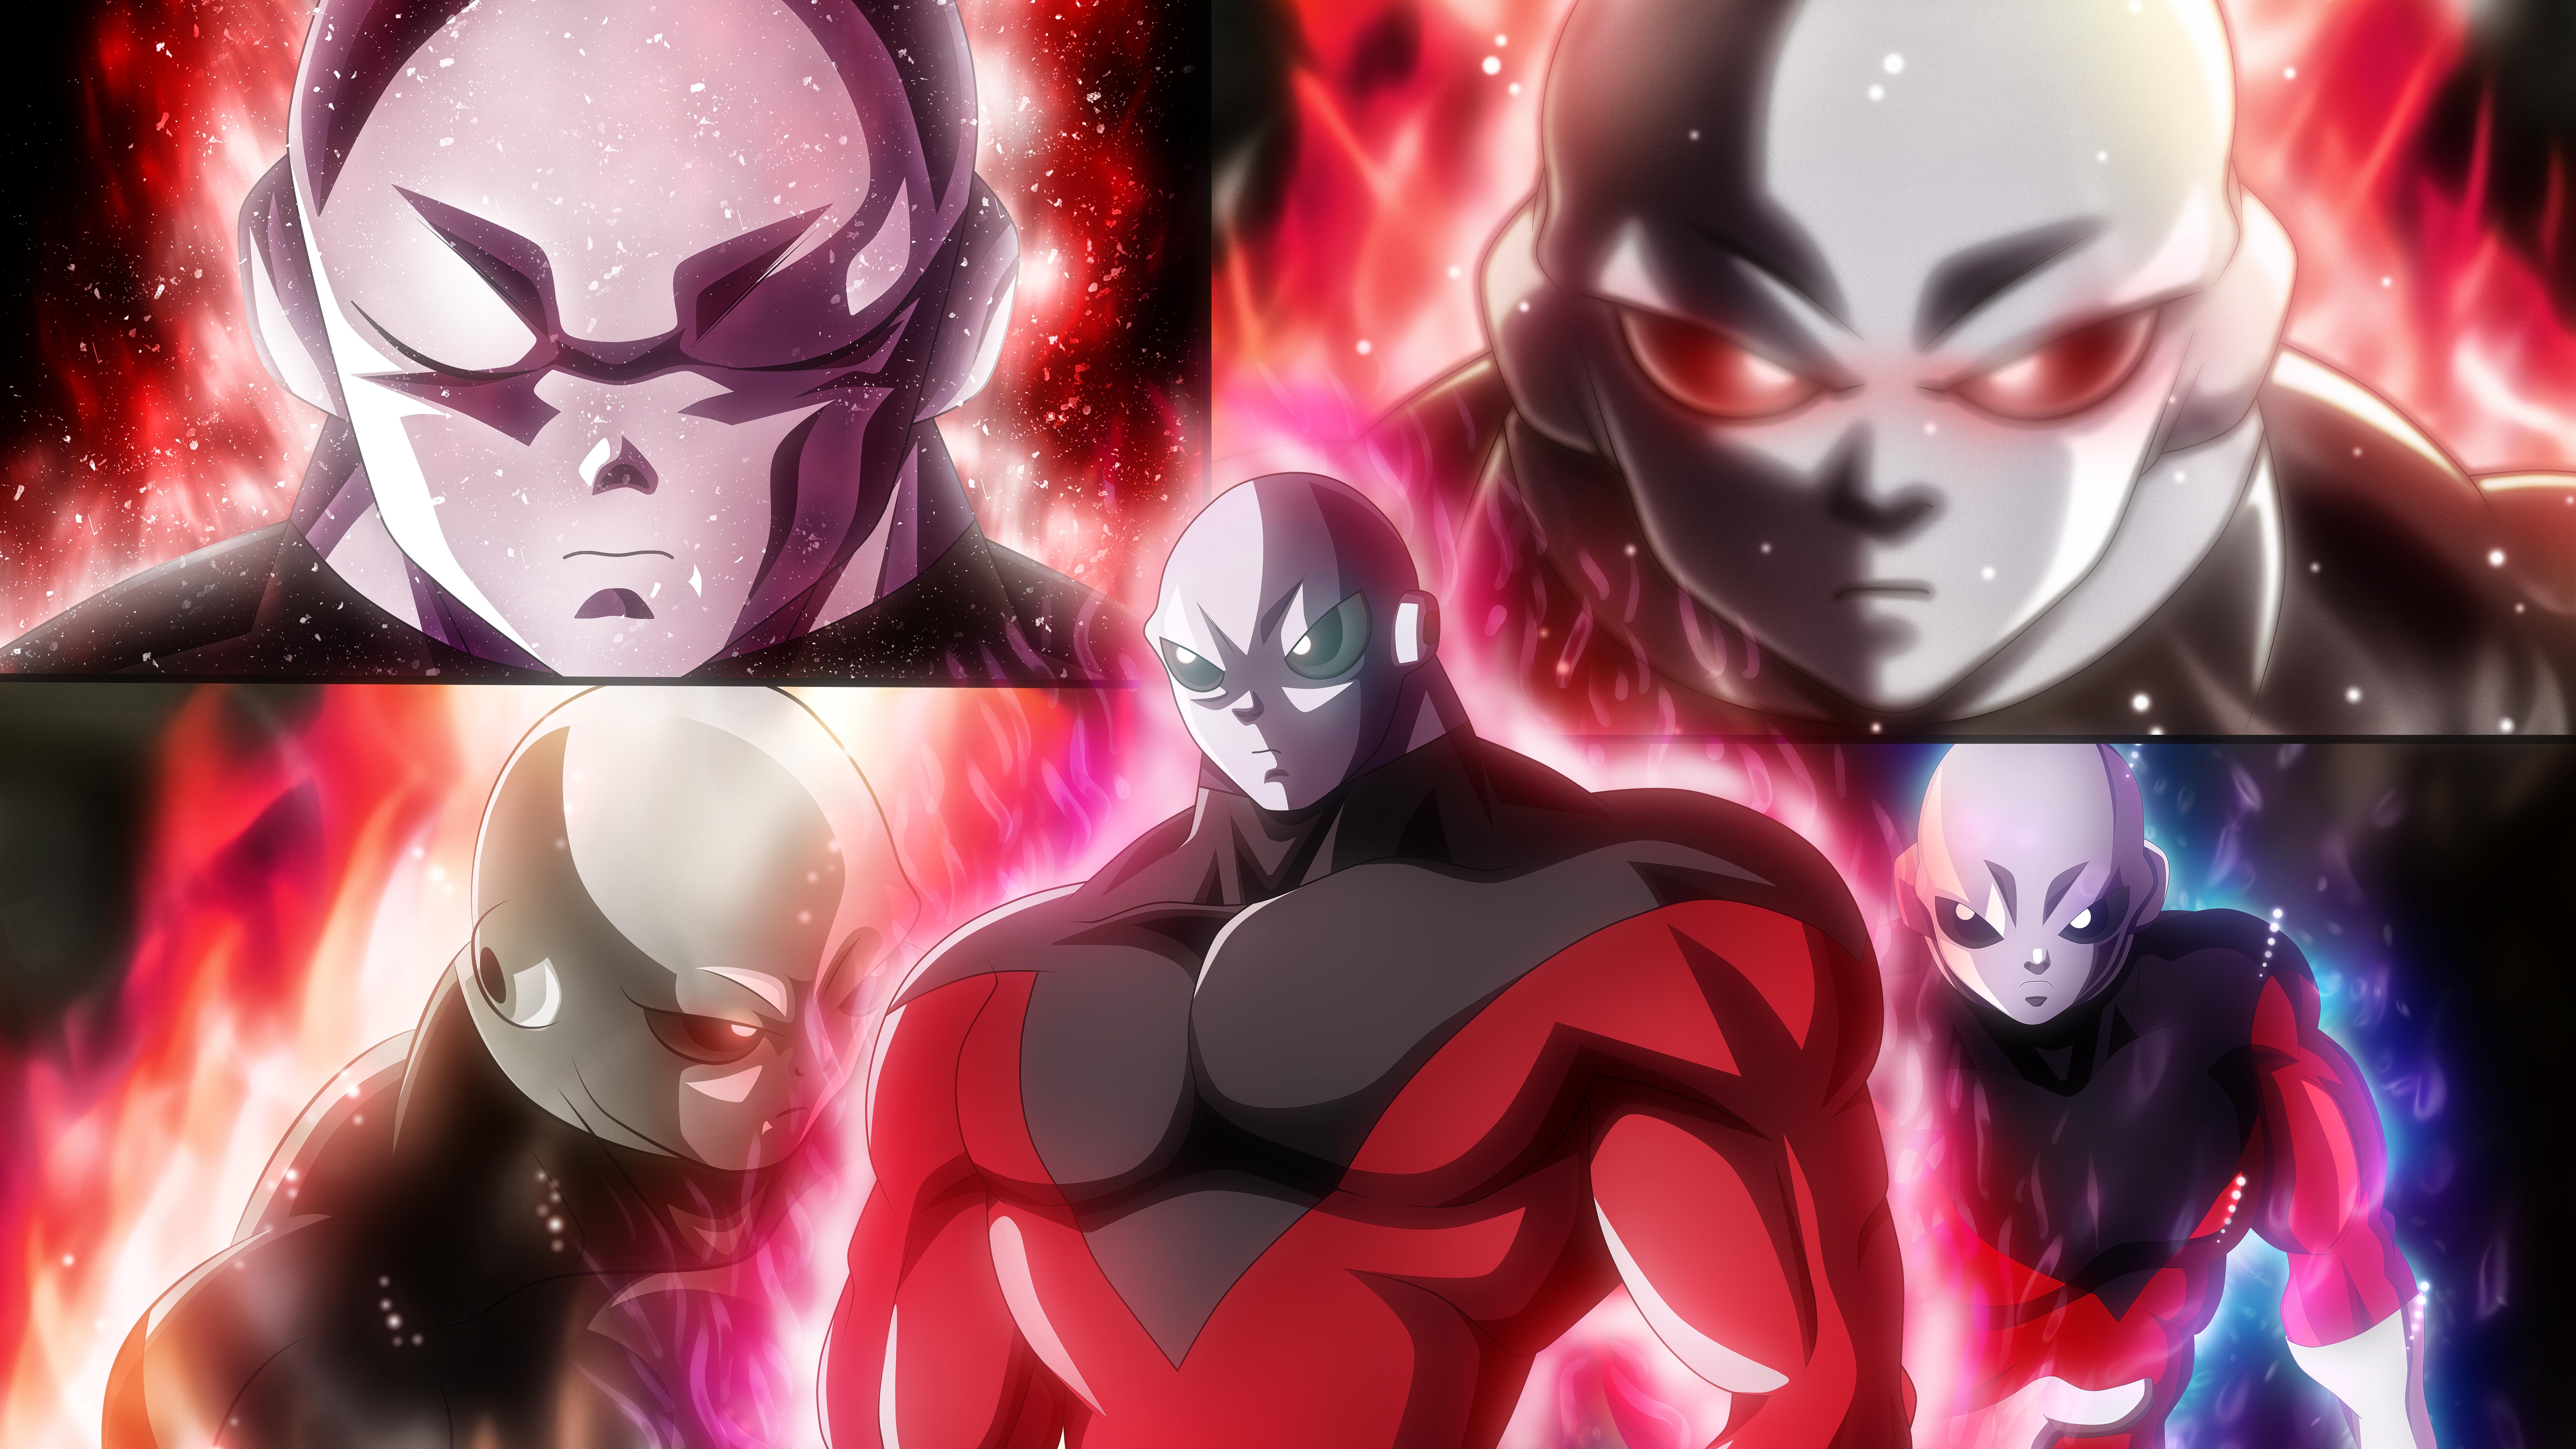 Anime 7680x4320 Dragon Ball Dragon Ball Super jiren